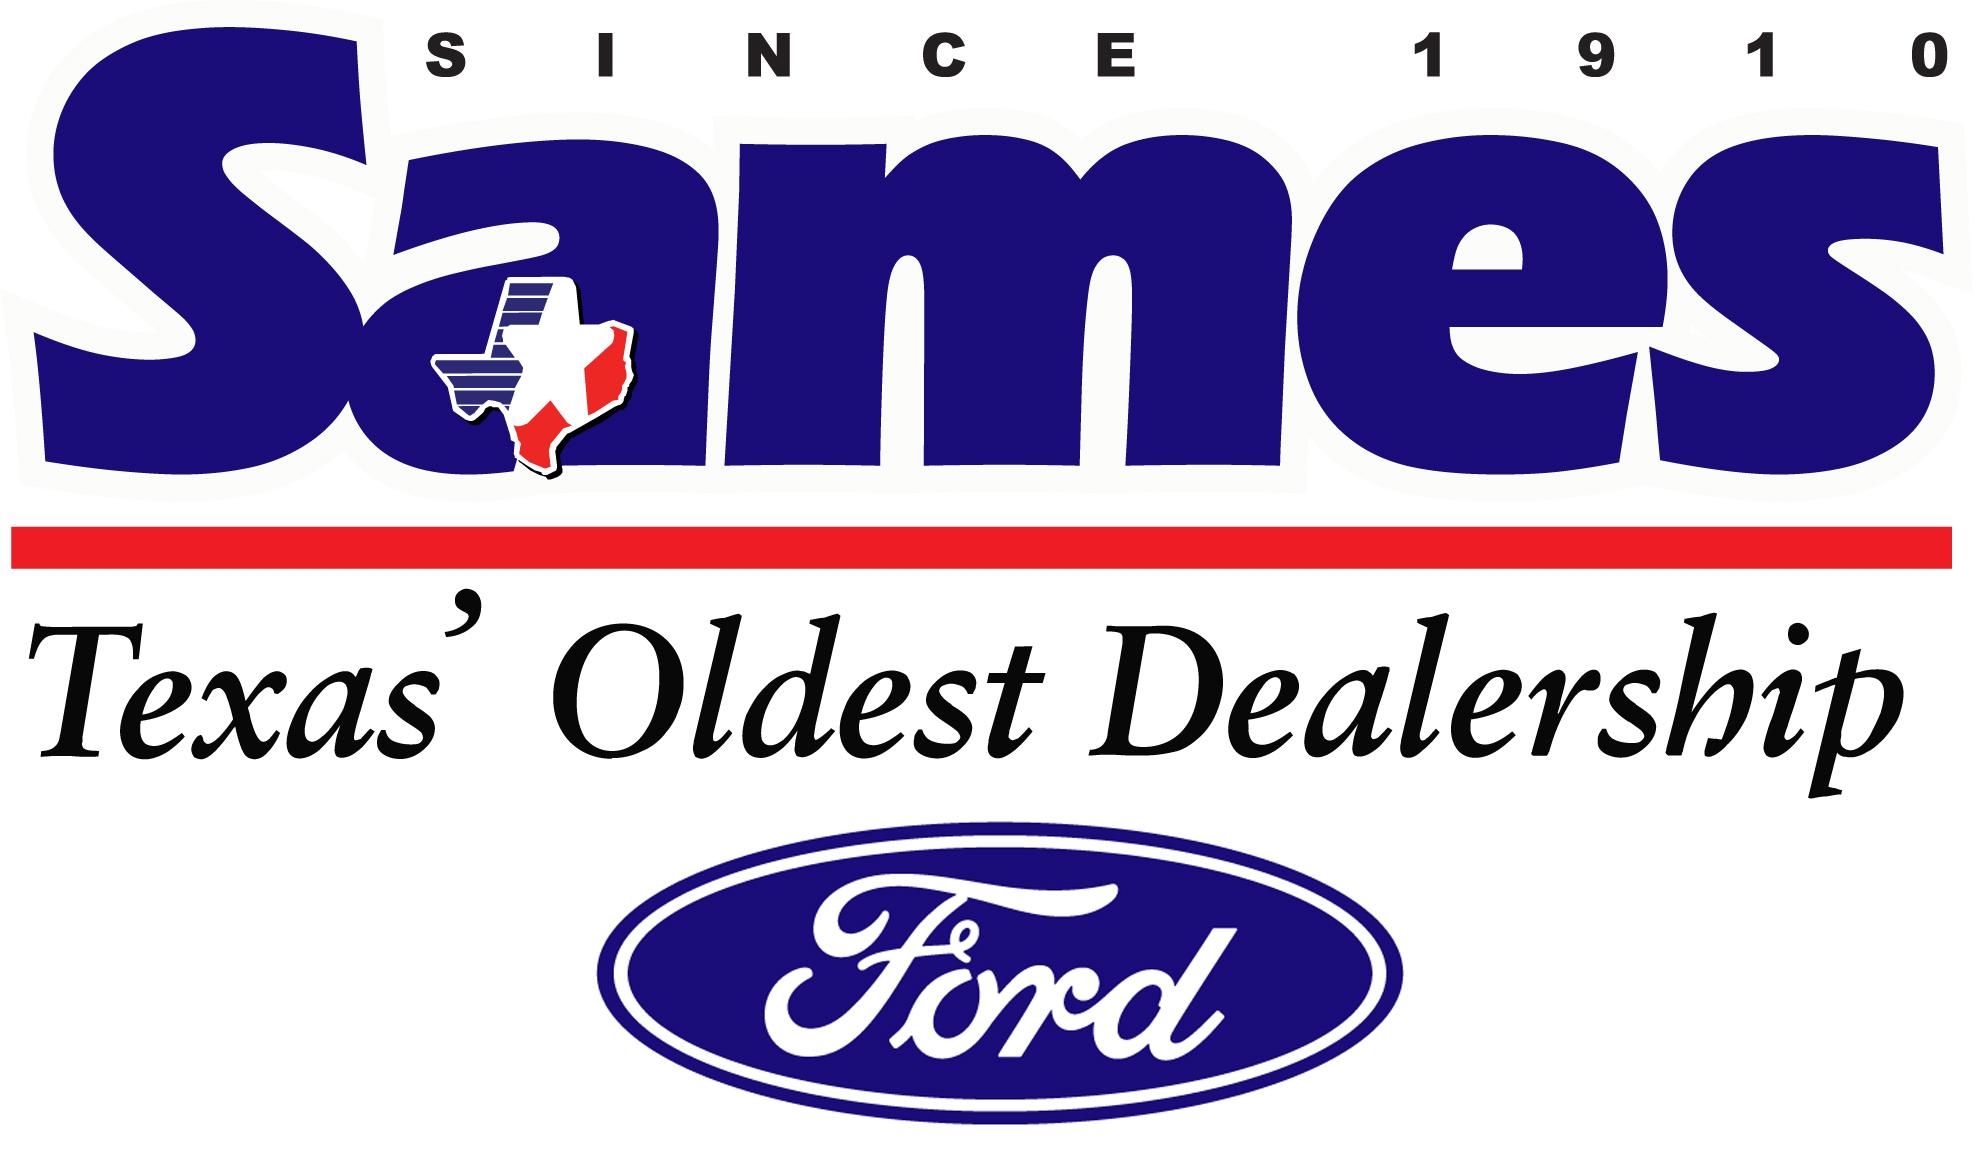 Sames logo